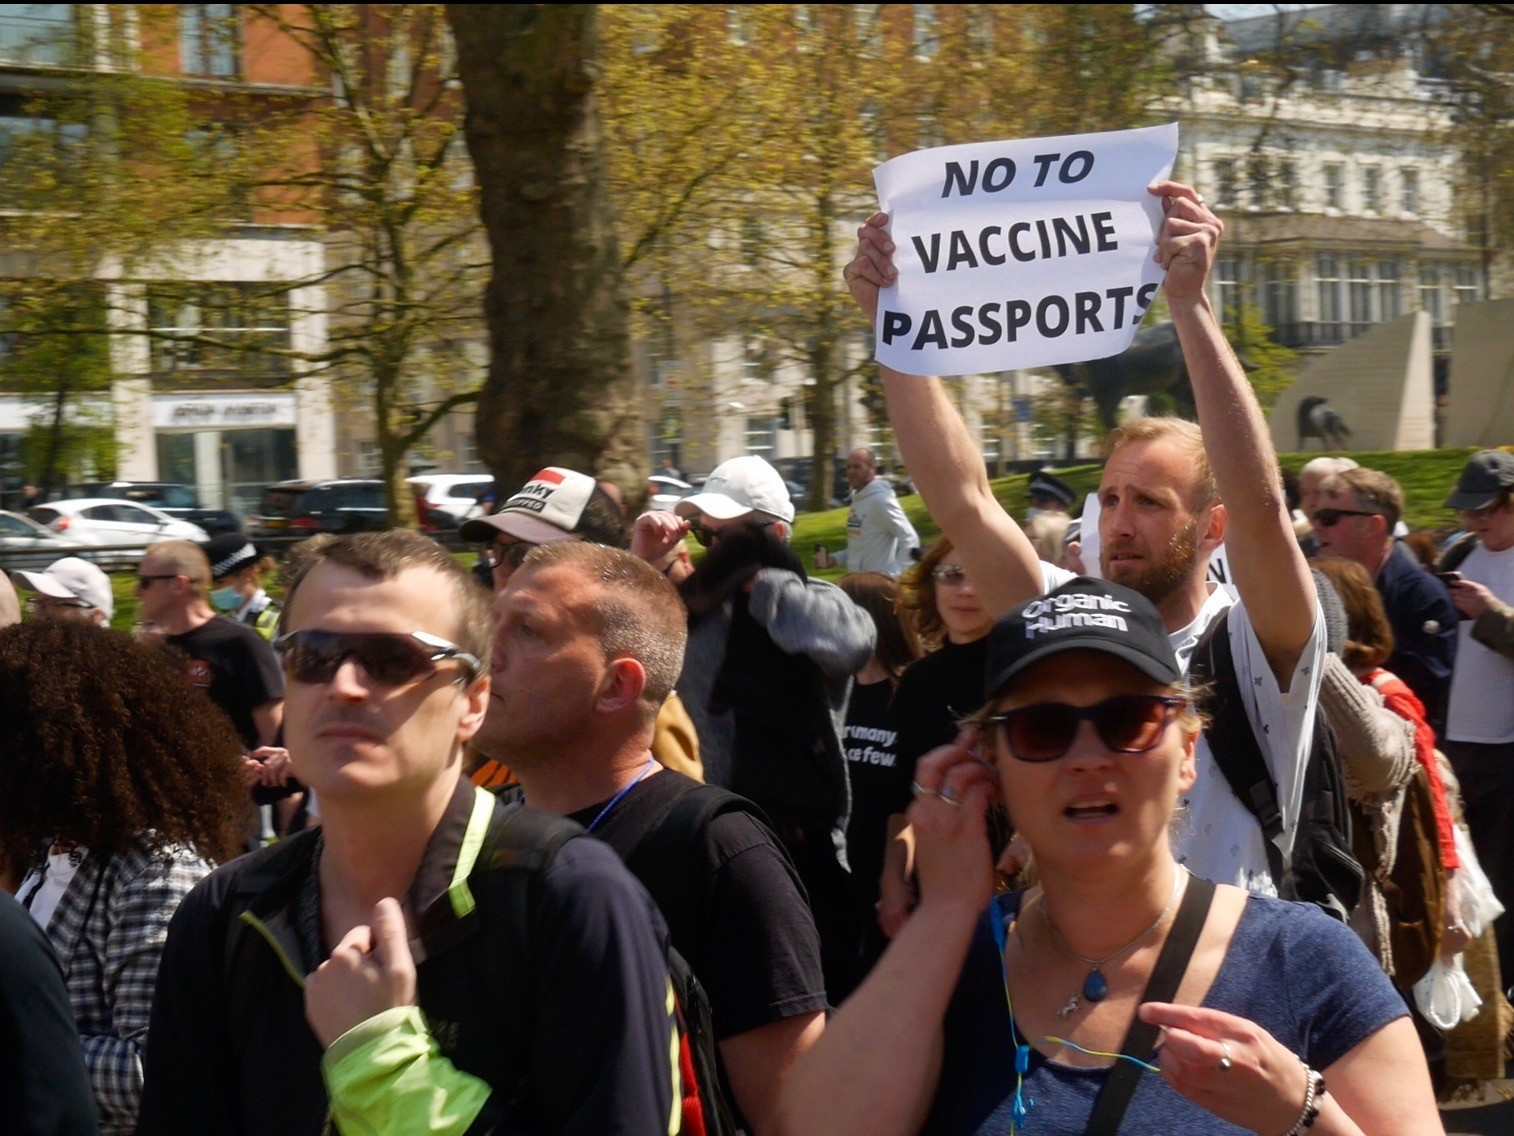 Thousands of anti-lockdown demonstrators took to the streets of London to protest against coronavirus vaccine passports. April 24, 2021. Kurt Zindulka, Breitbart News